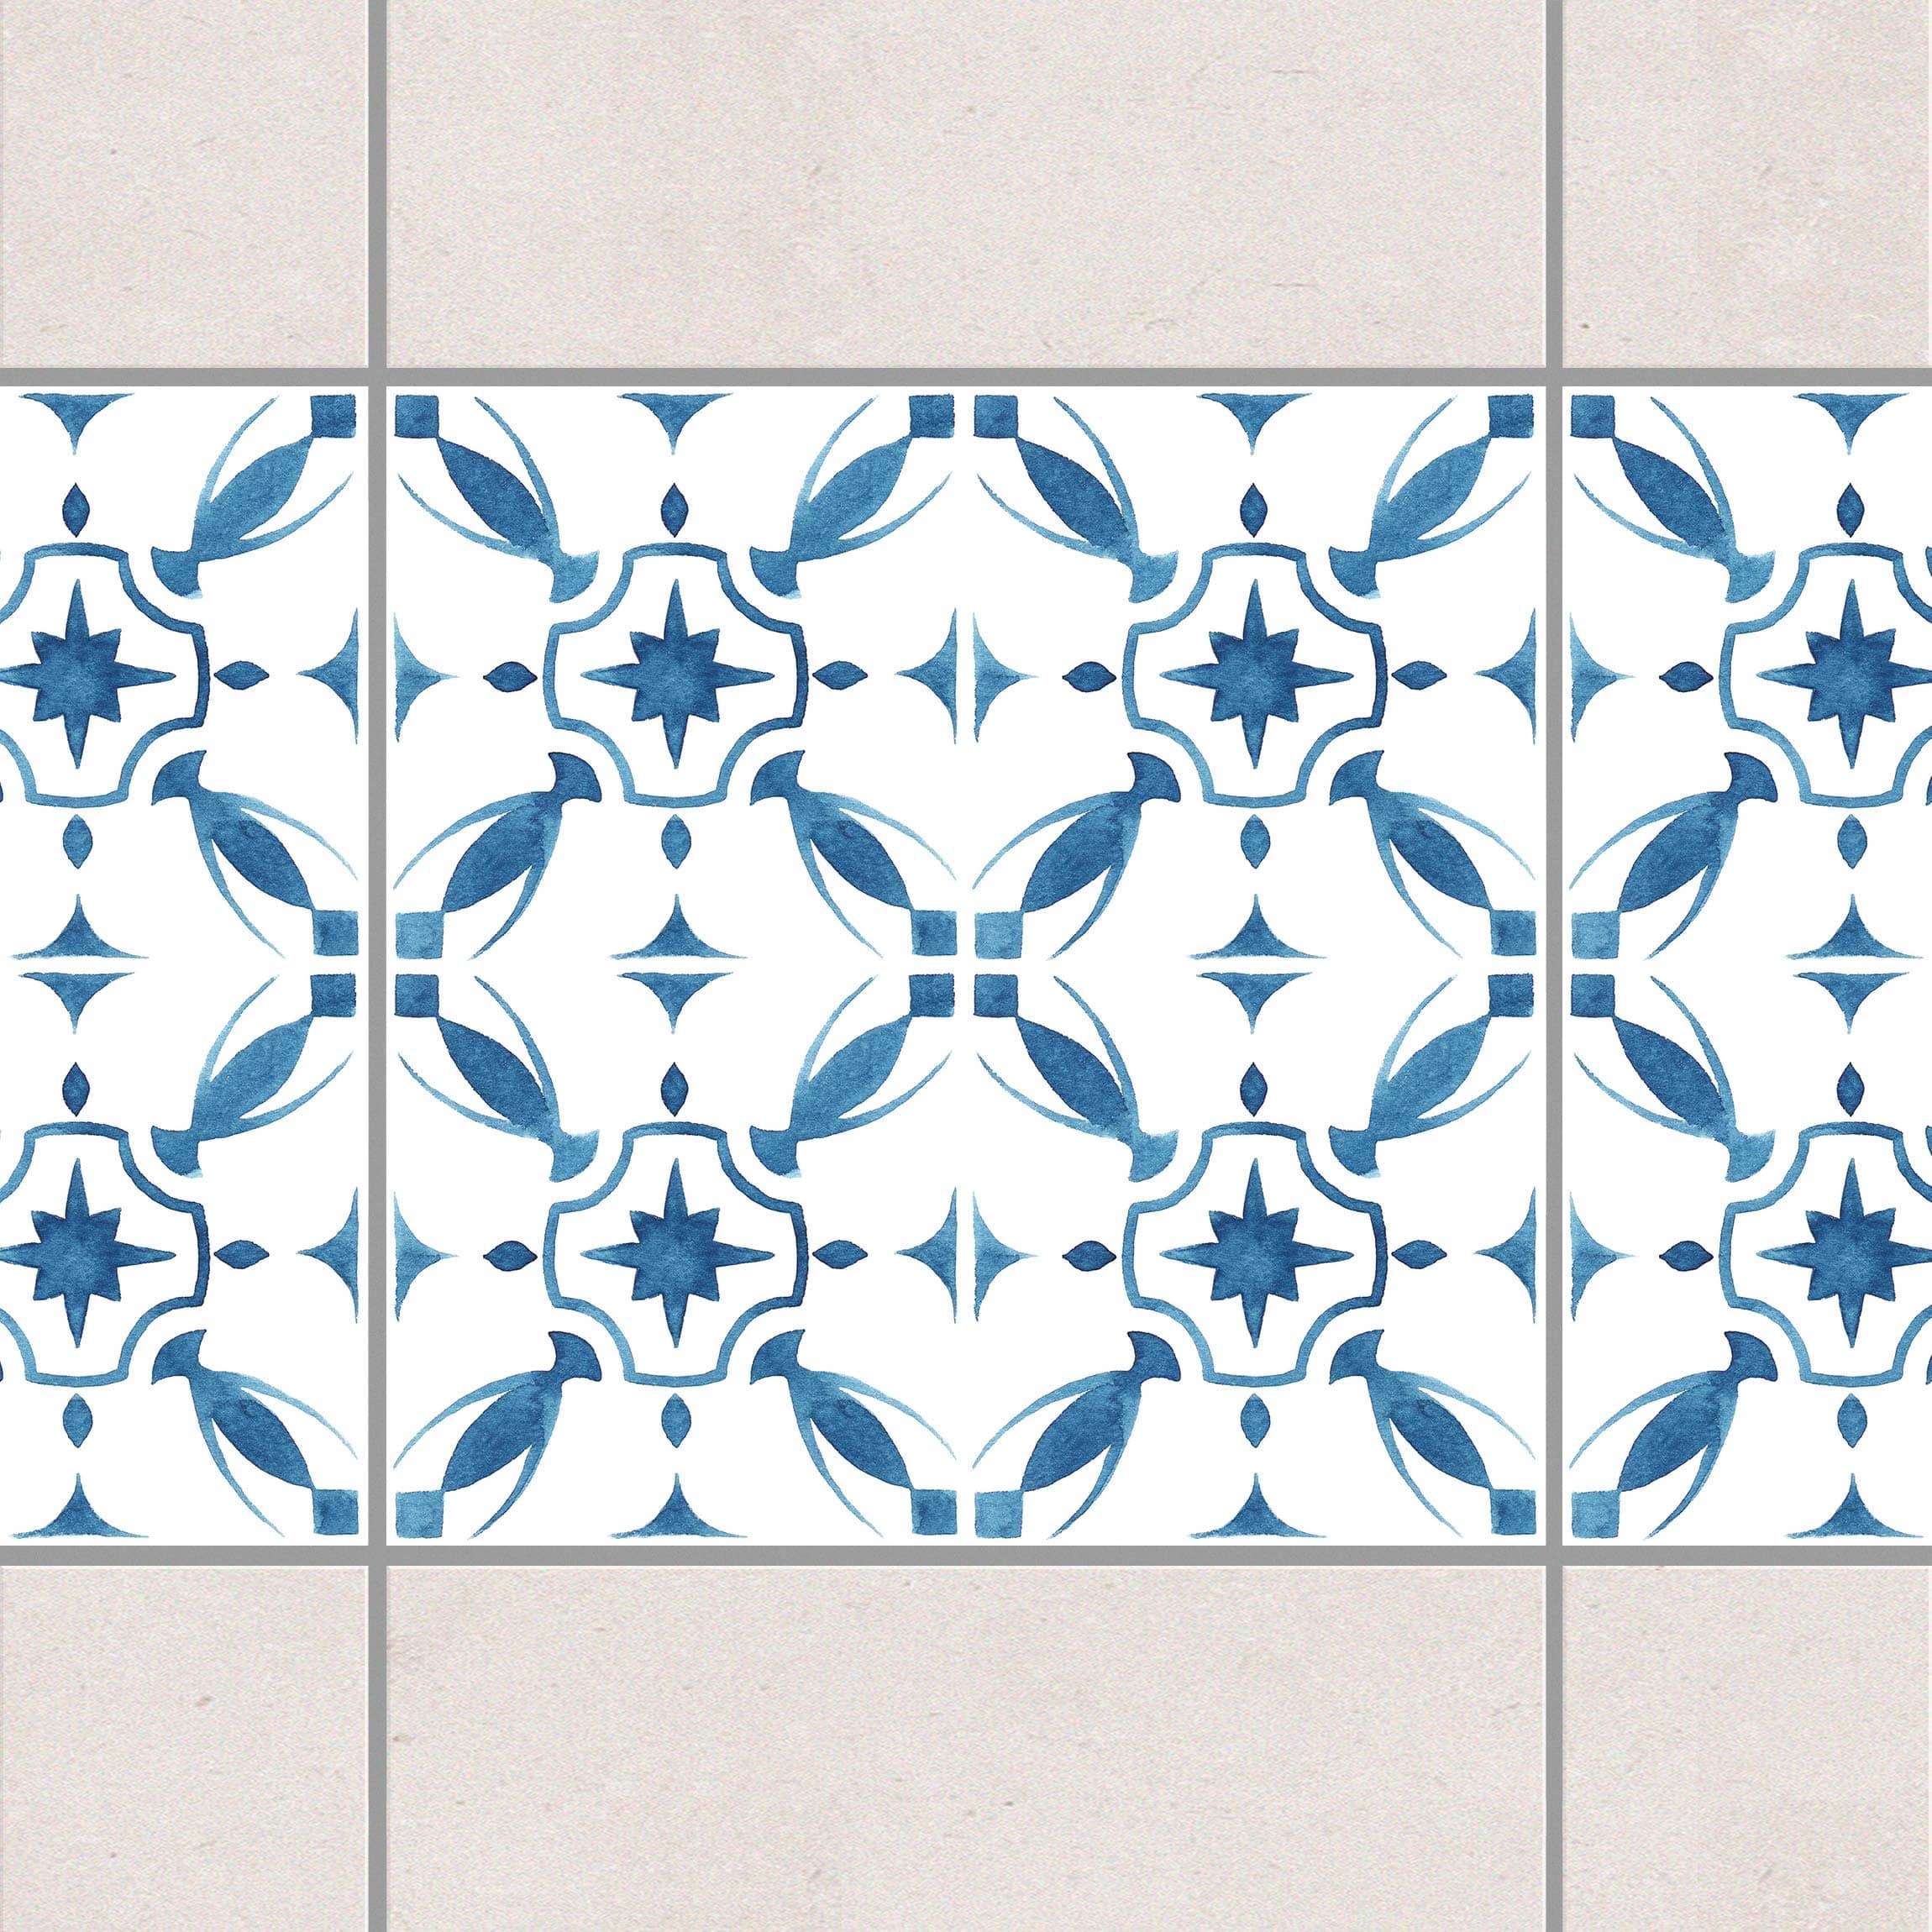 fliesen bord re blau wei muster serie no 1 1 1 quadrat 20cm x 20cm fliesenaufkleber. Black Bedroom Furniture Sets. Home Design Ideas